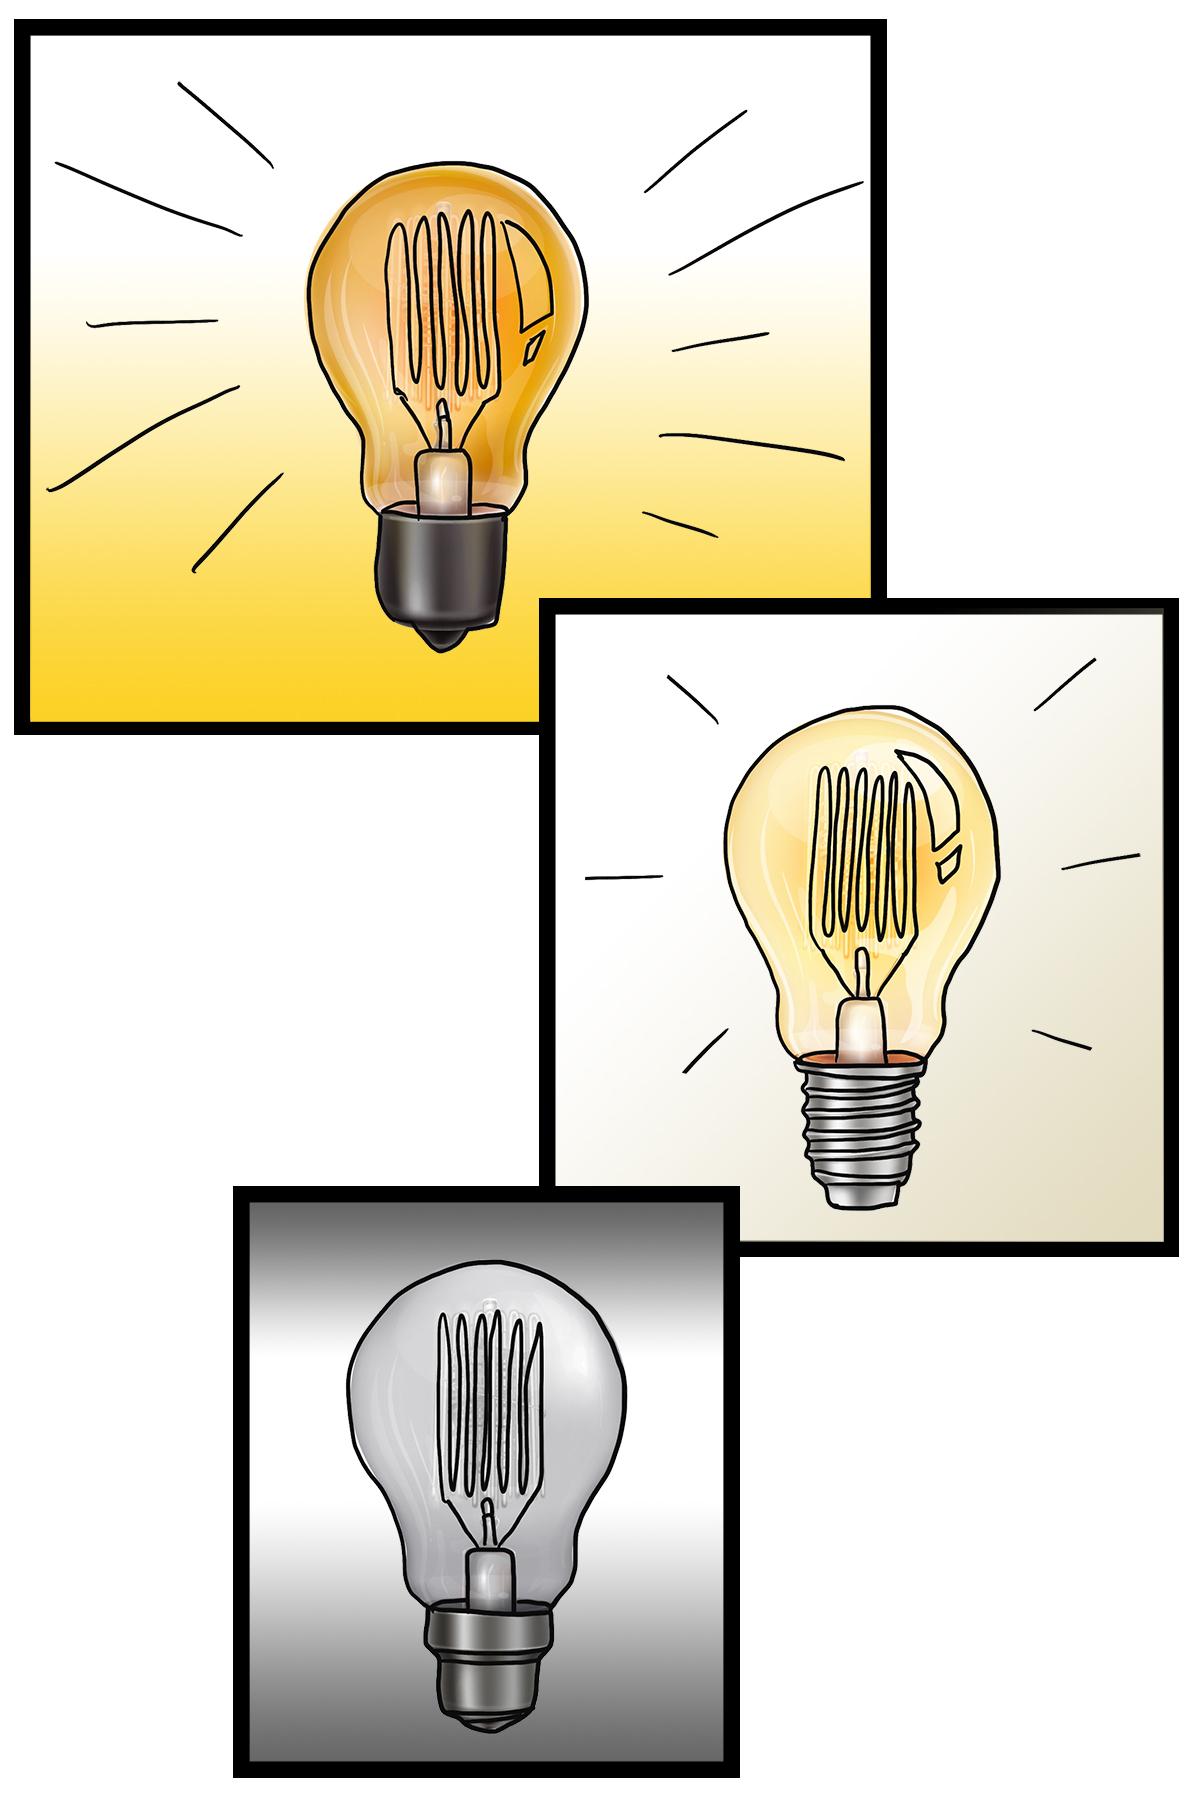 light-bulbs-cartoon-strip-m.jpg